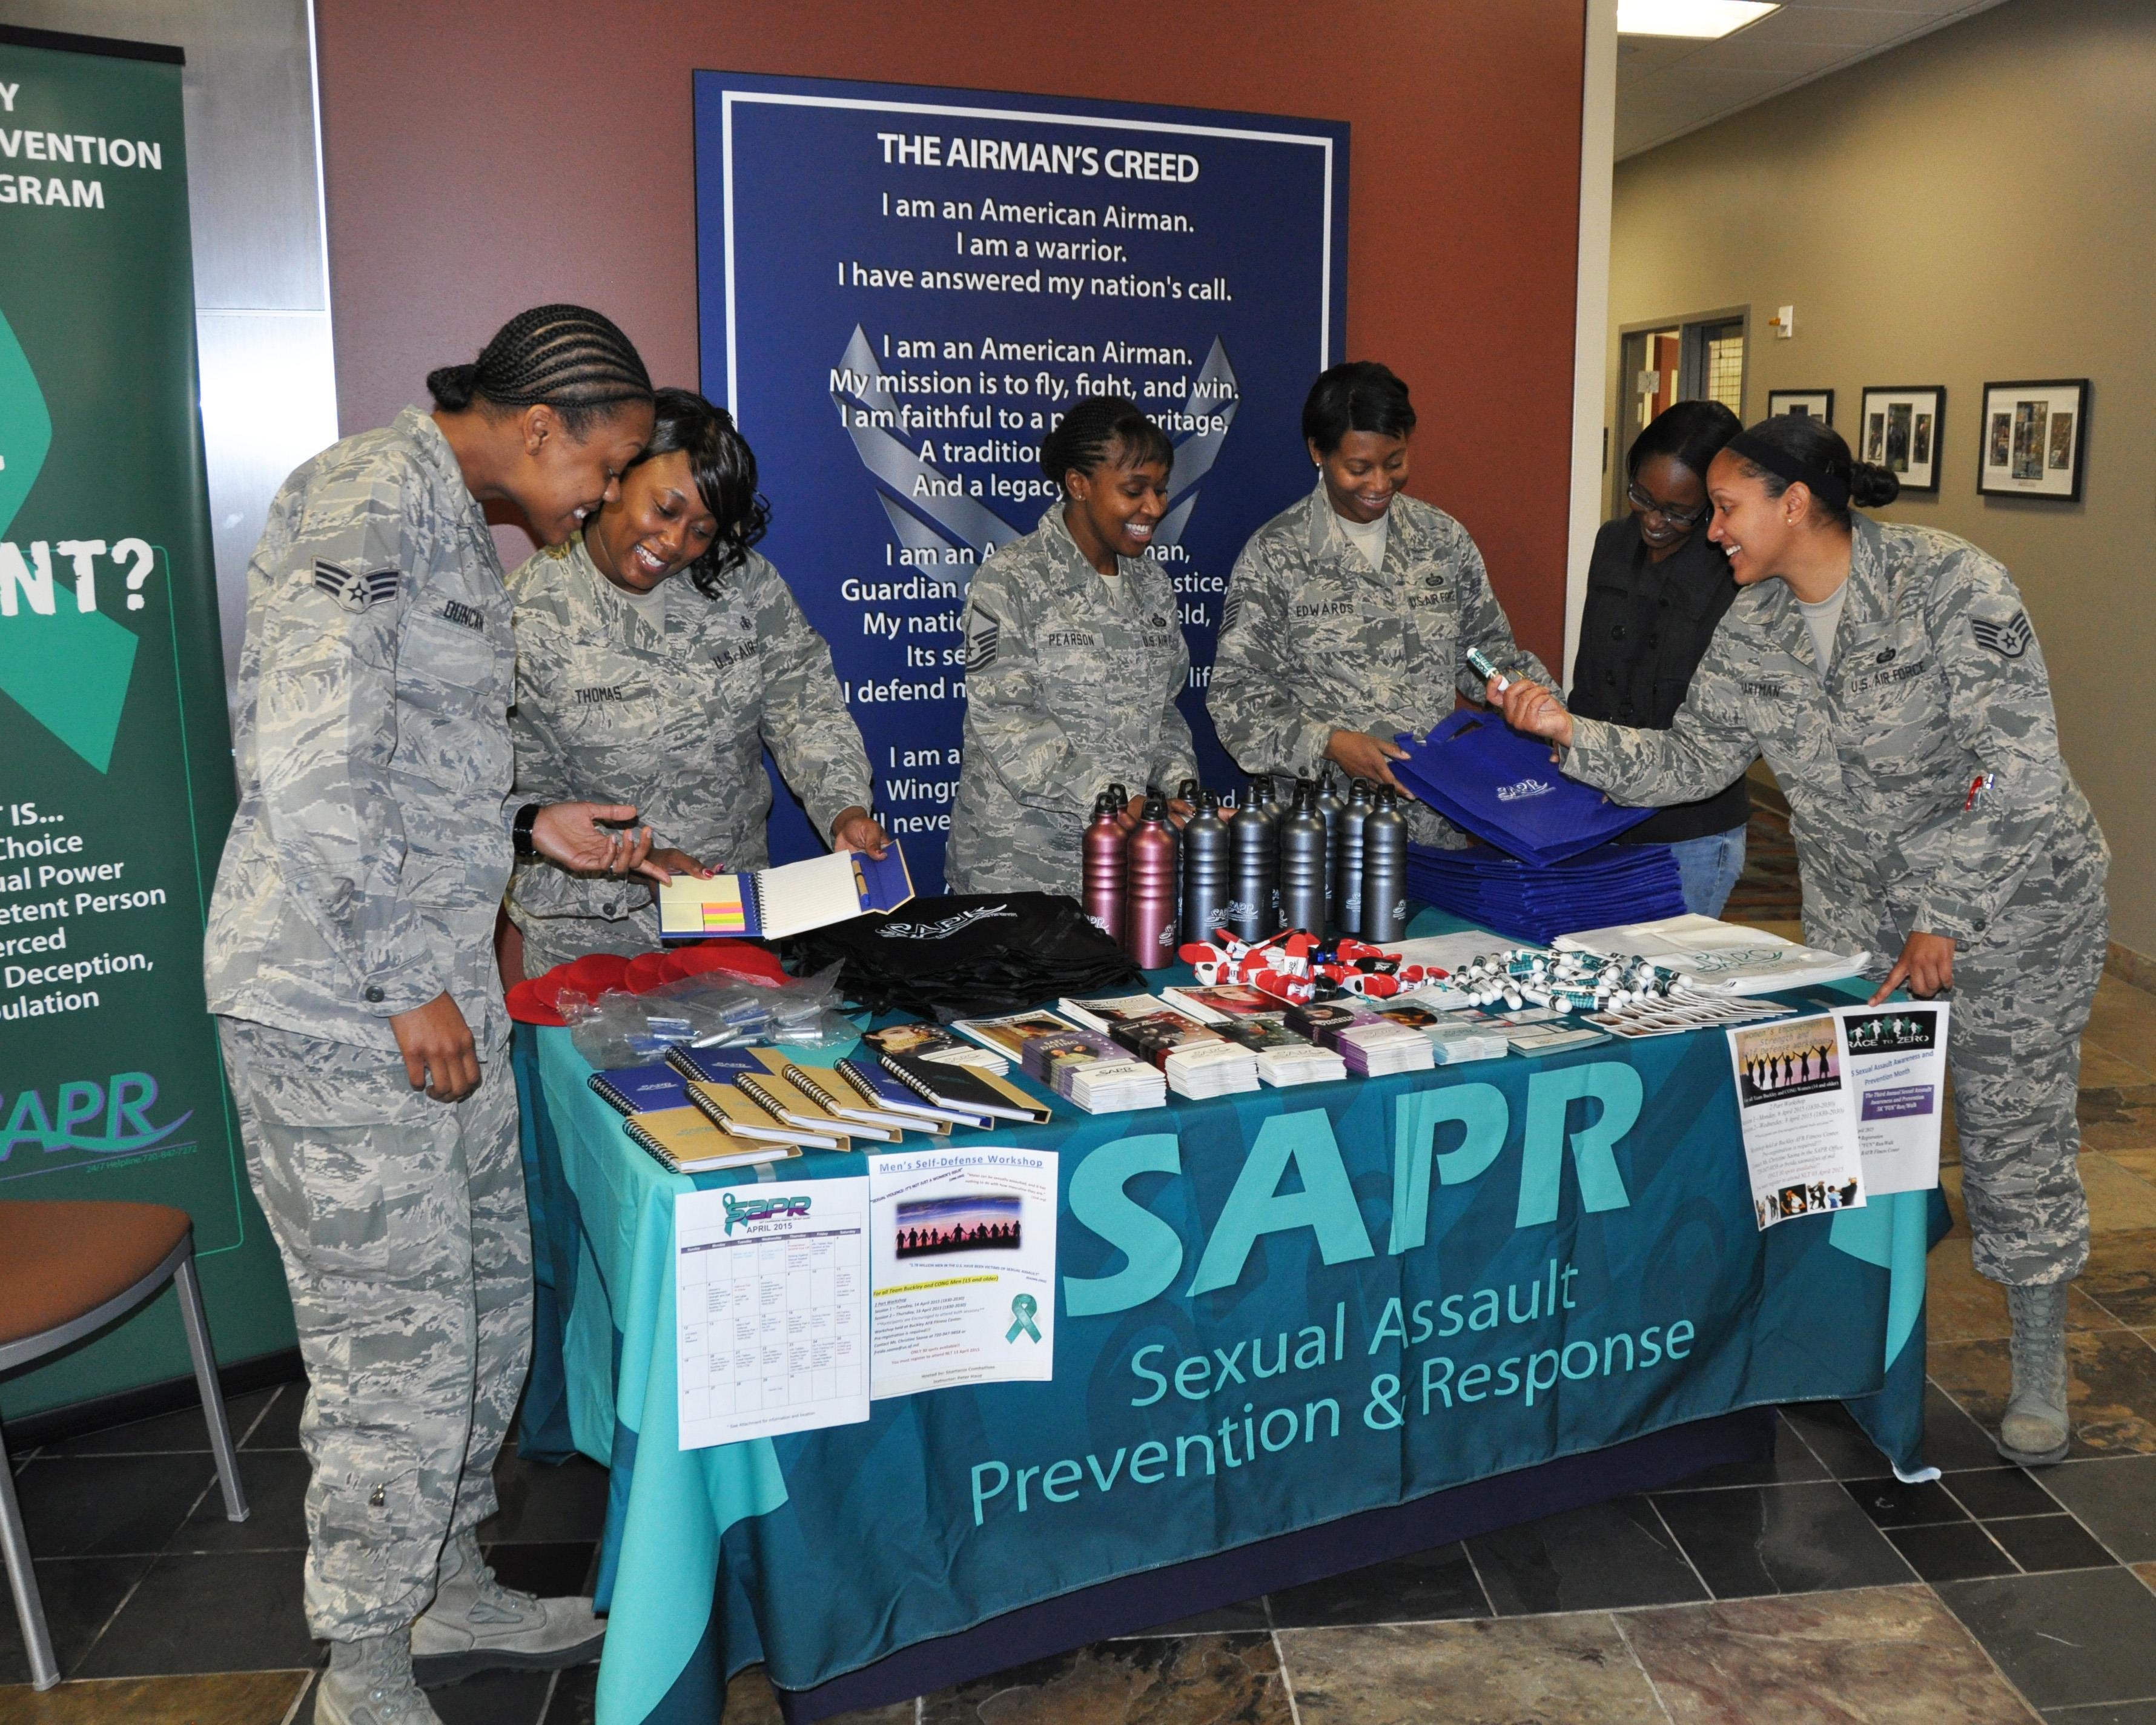 ARPC commander's message: Sexual Assault Awareness Month